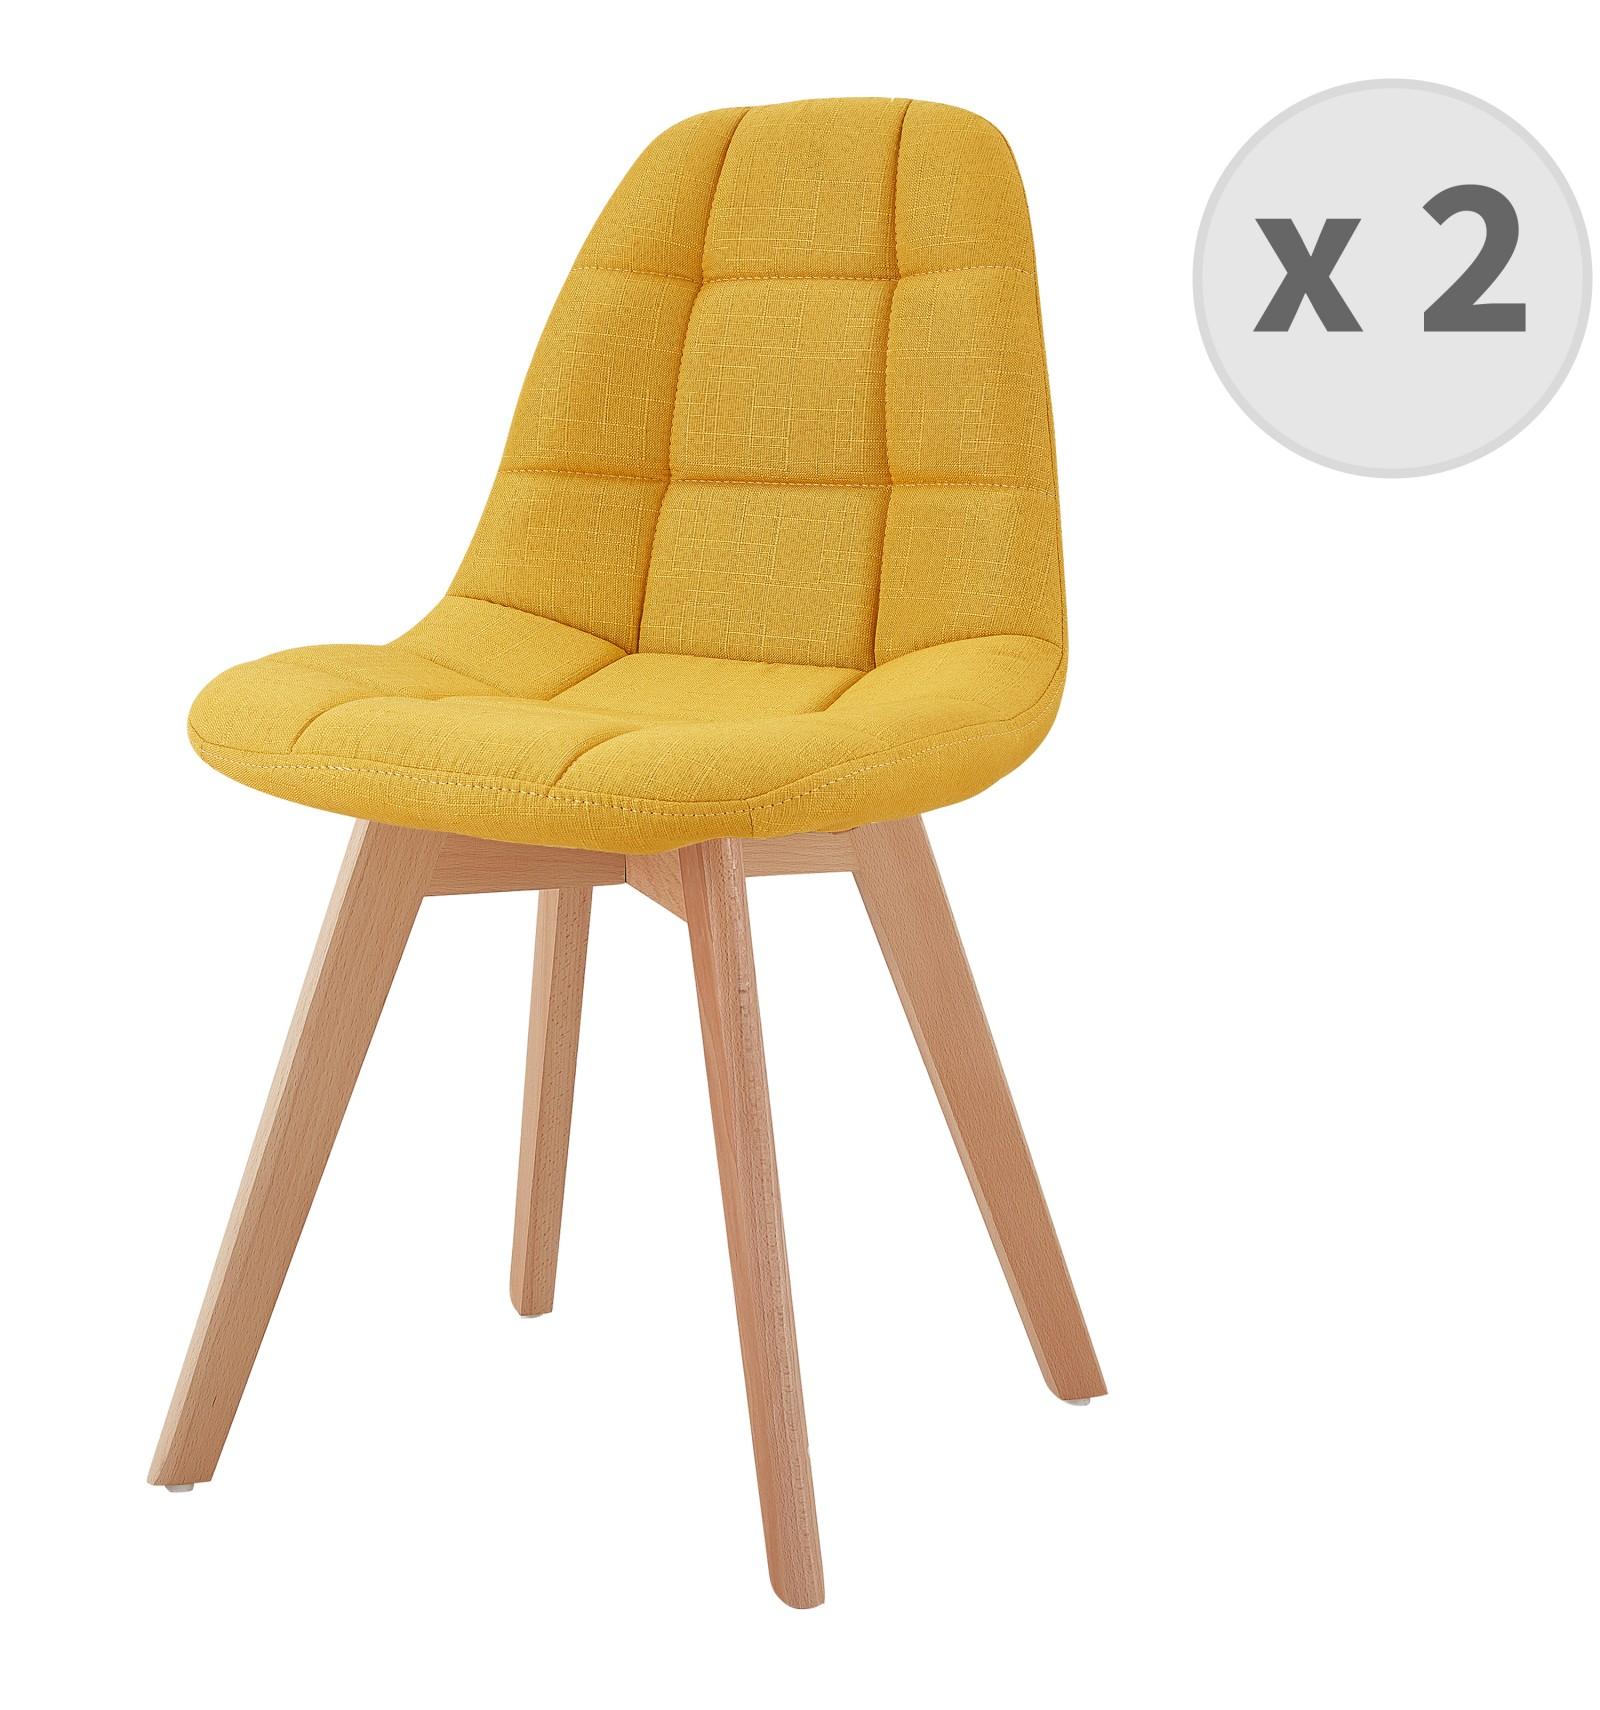 chaise scandinave jaune moutarde stella